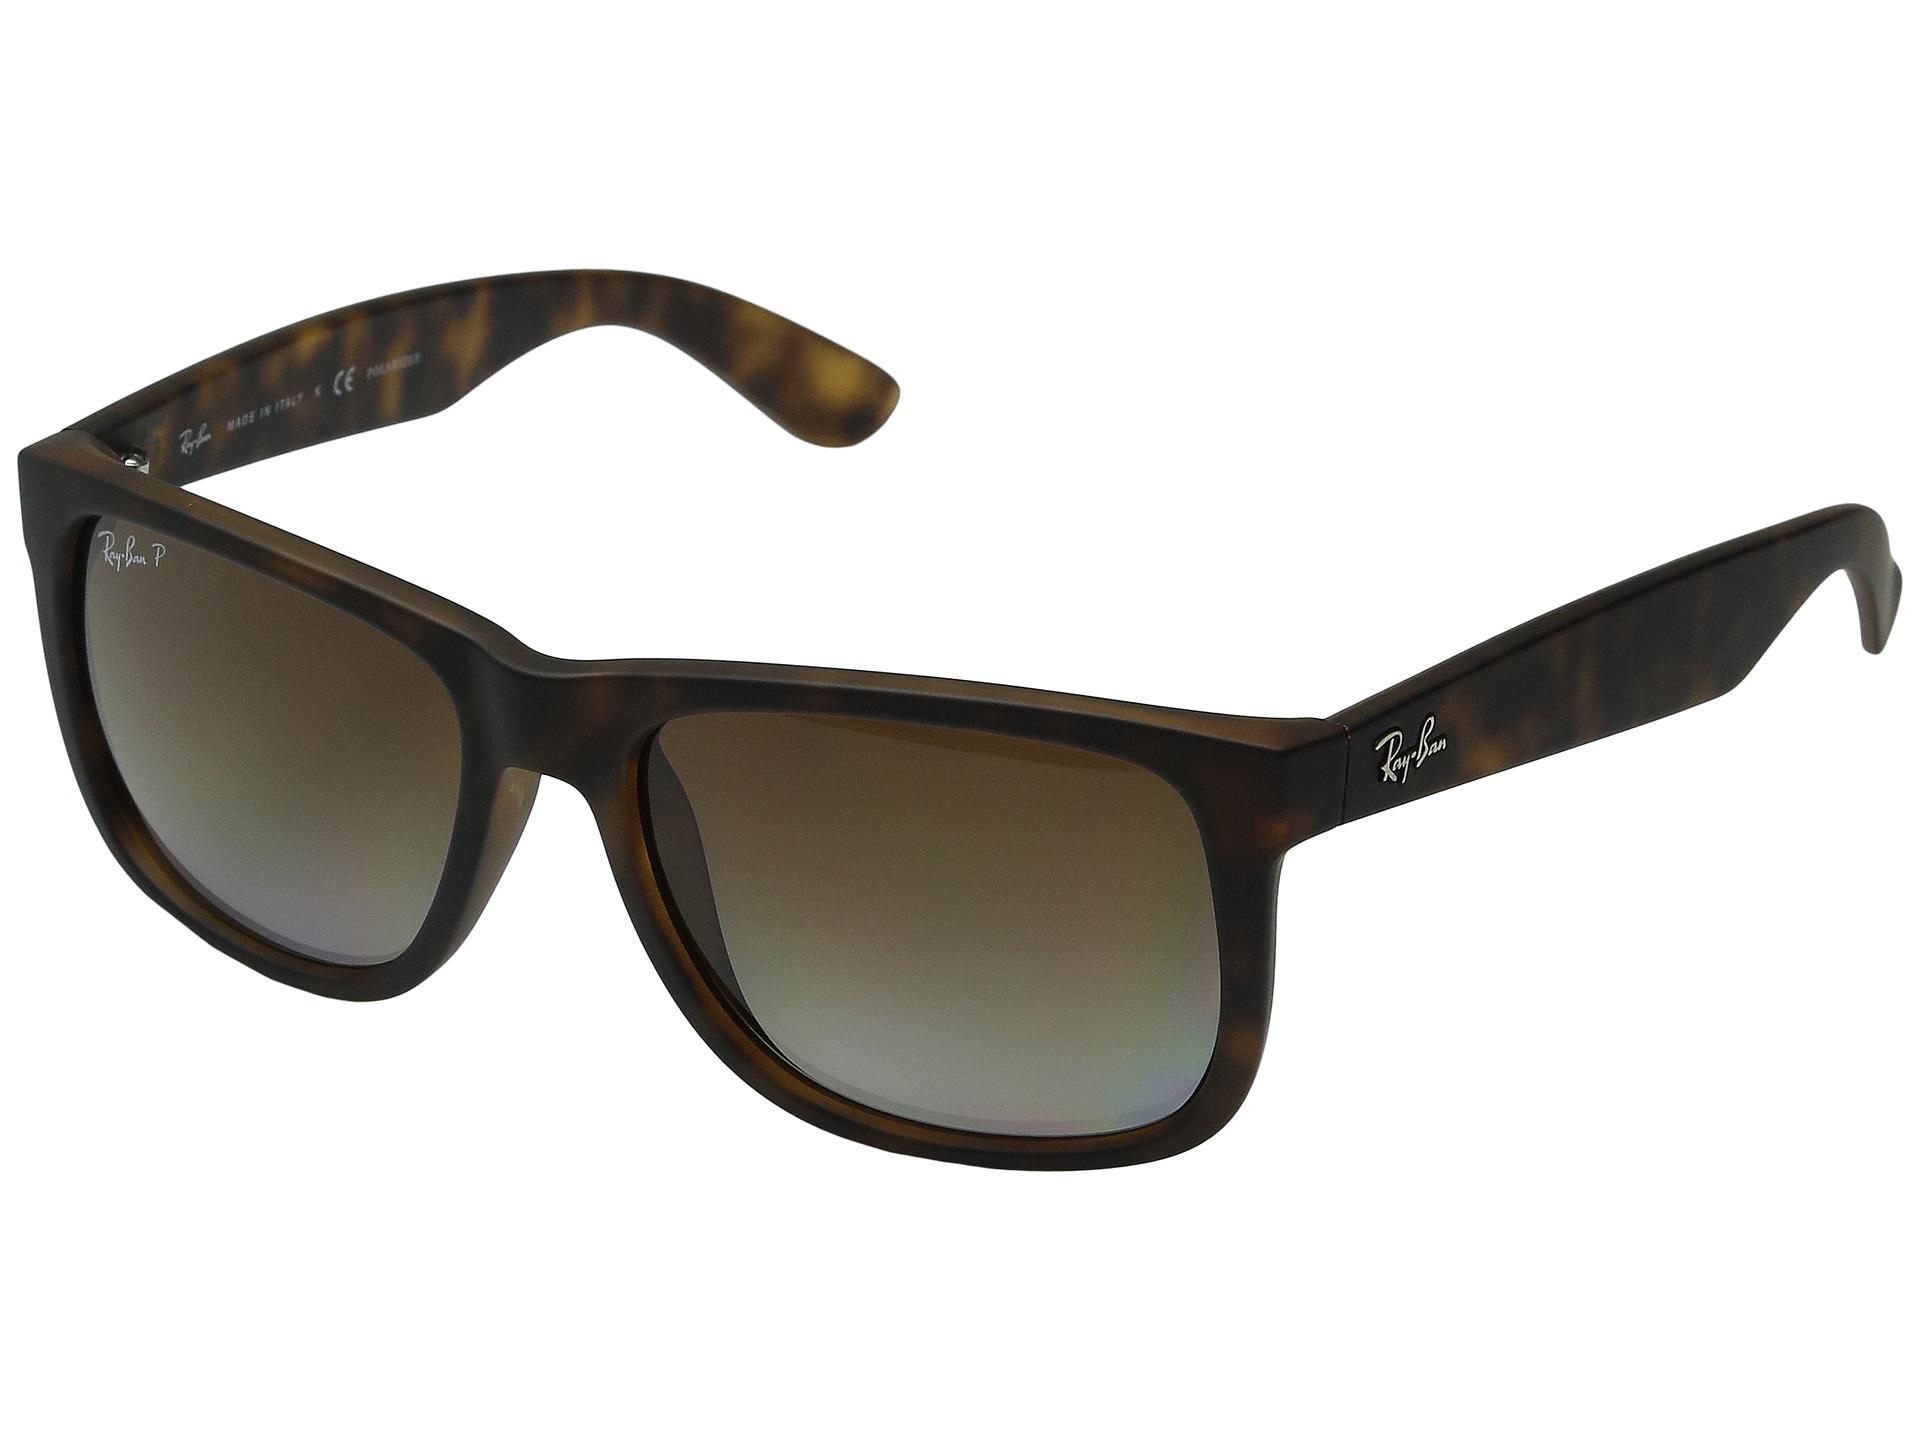 84b5949da8 Ray Ban Boyfriend Sunglasses Sunglass Hut « Heritage Malta